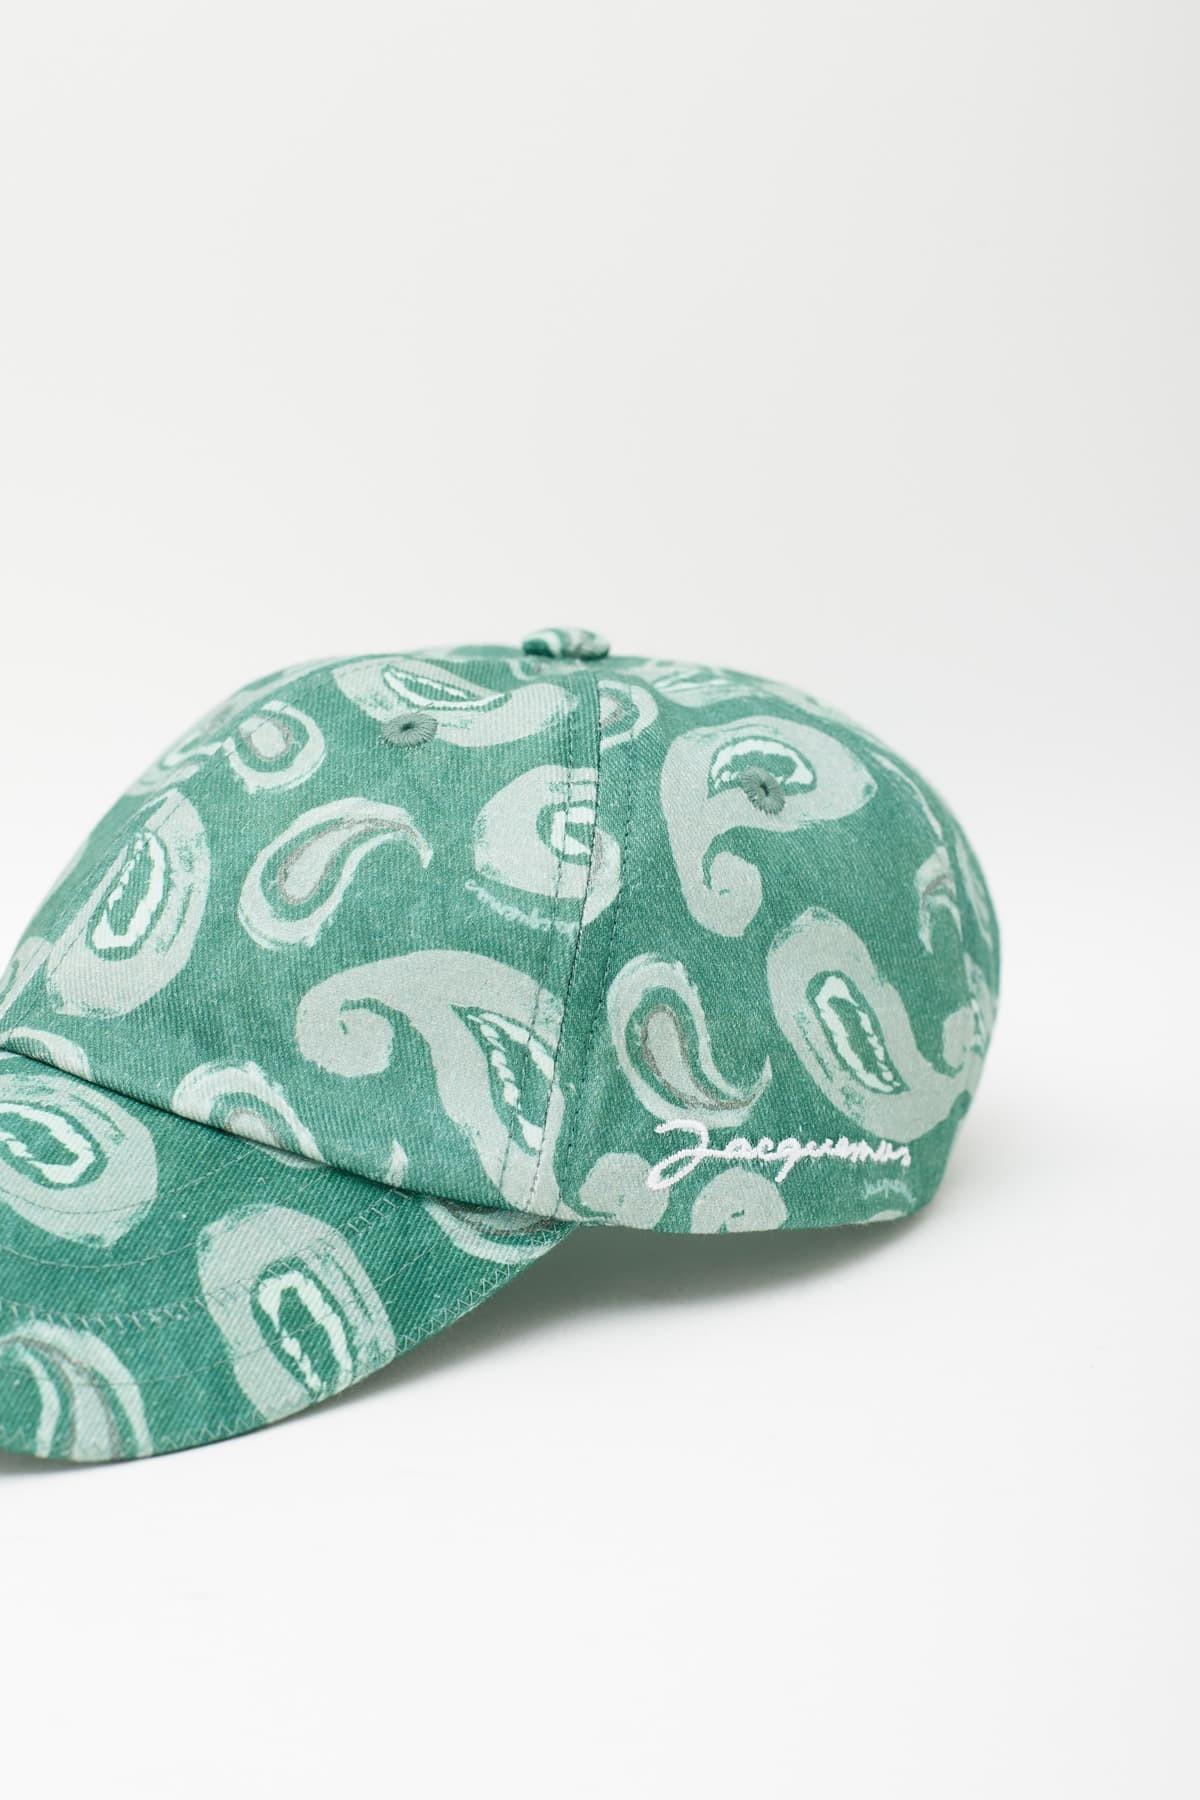 Shop RASSVET Blue Basic Logo Hoodie PACC9T025